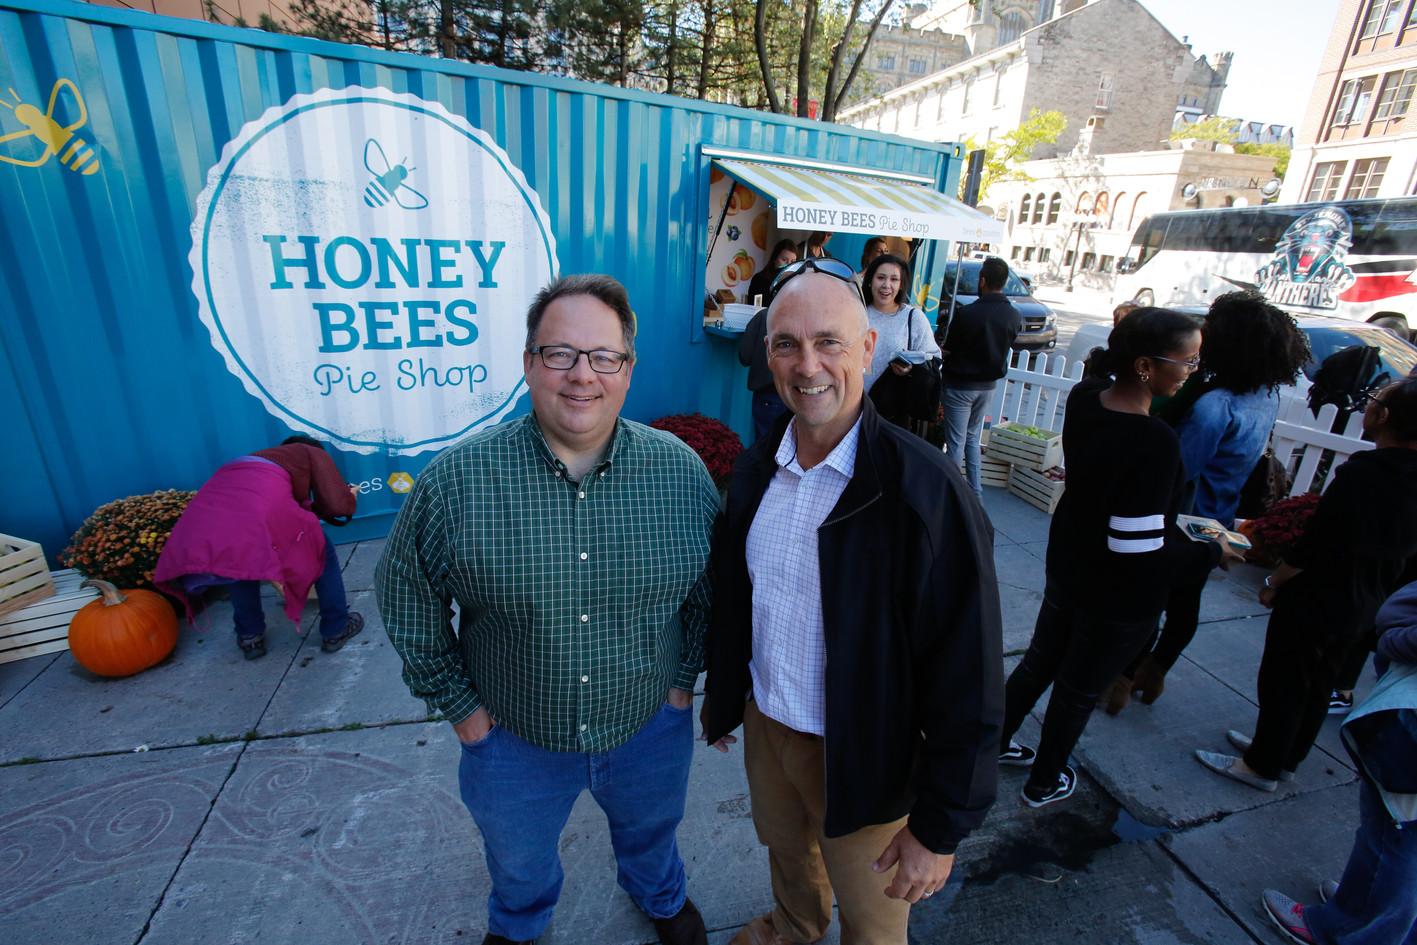 Honey Bees Pie Shop - Dennis Prouse and Jeff Reid